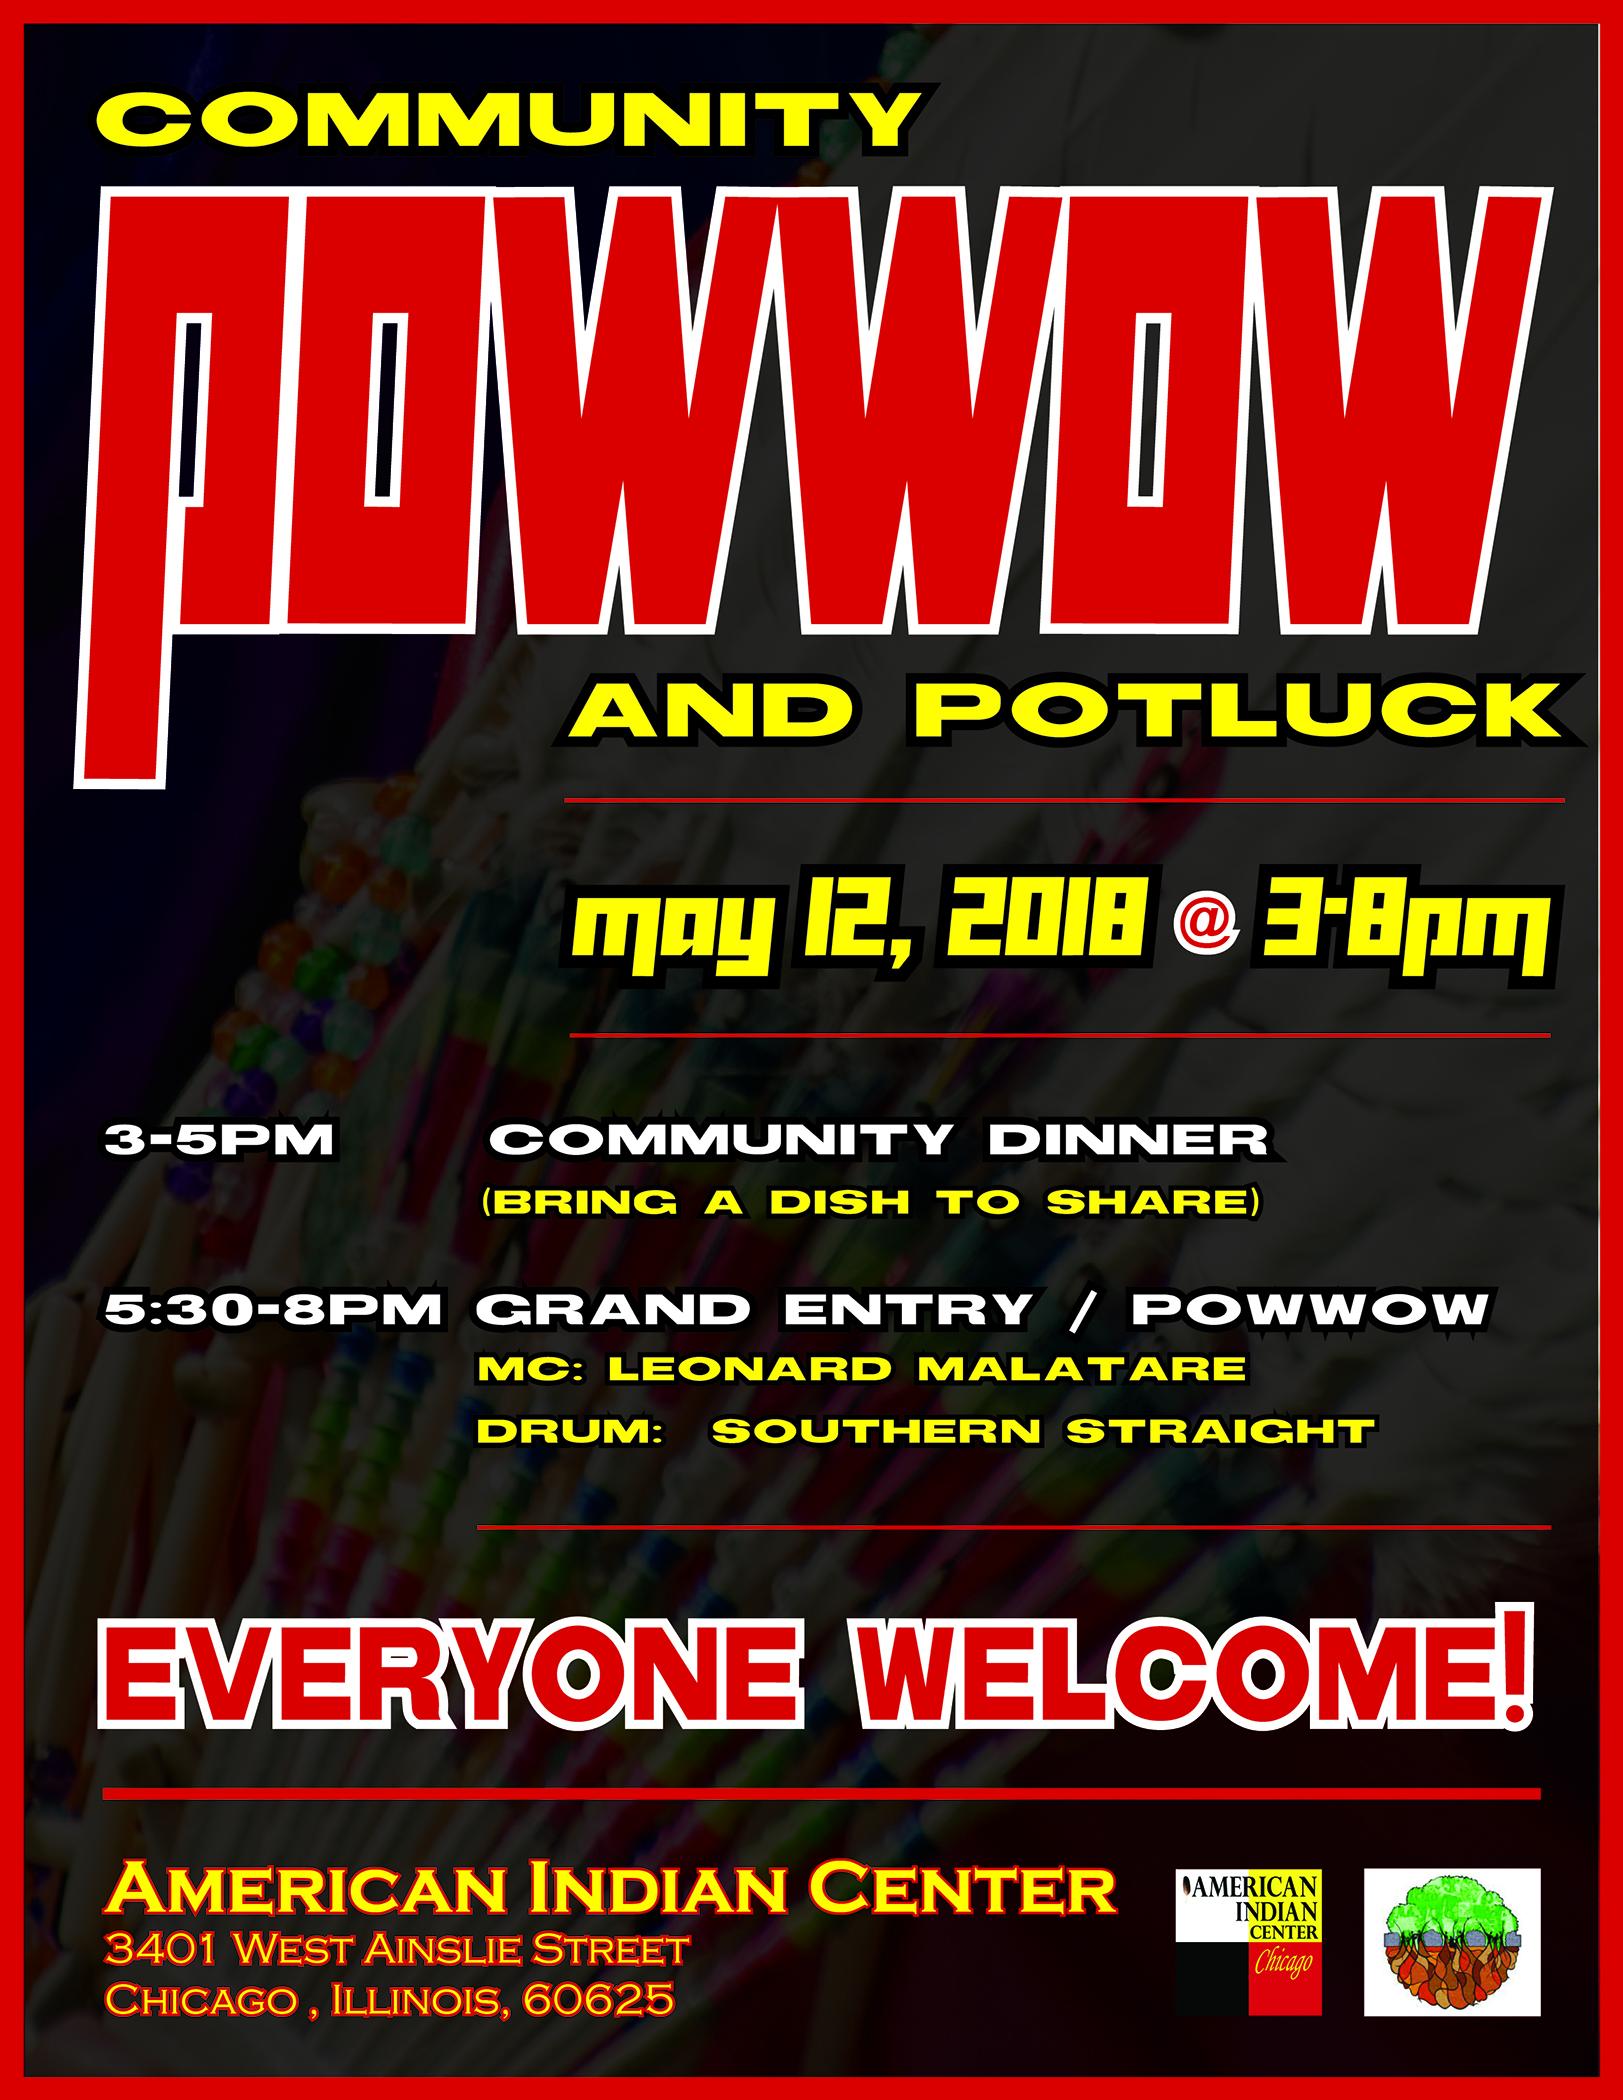 AIC Comm Powwow_May 2018.V3_SMALL.jpg